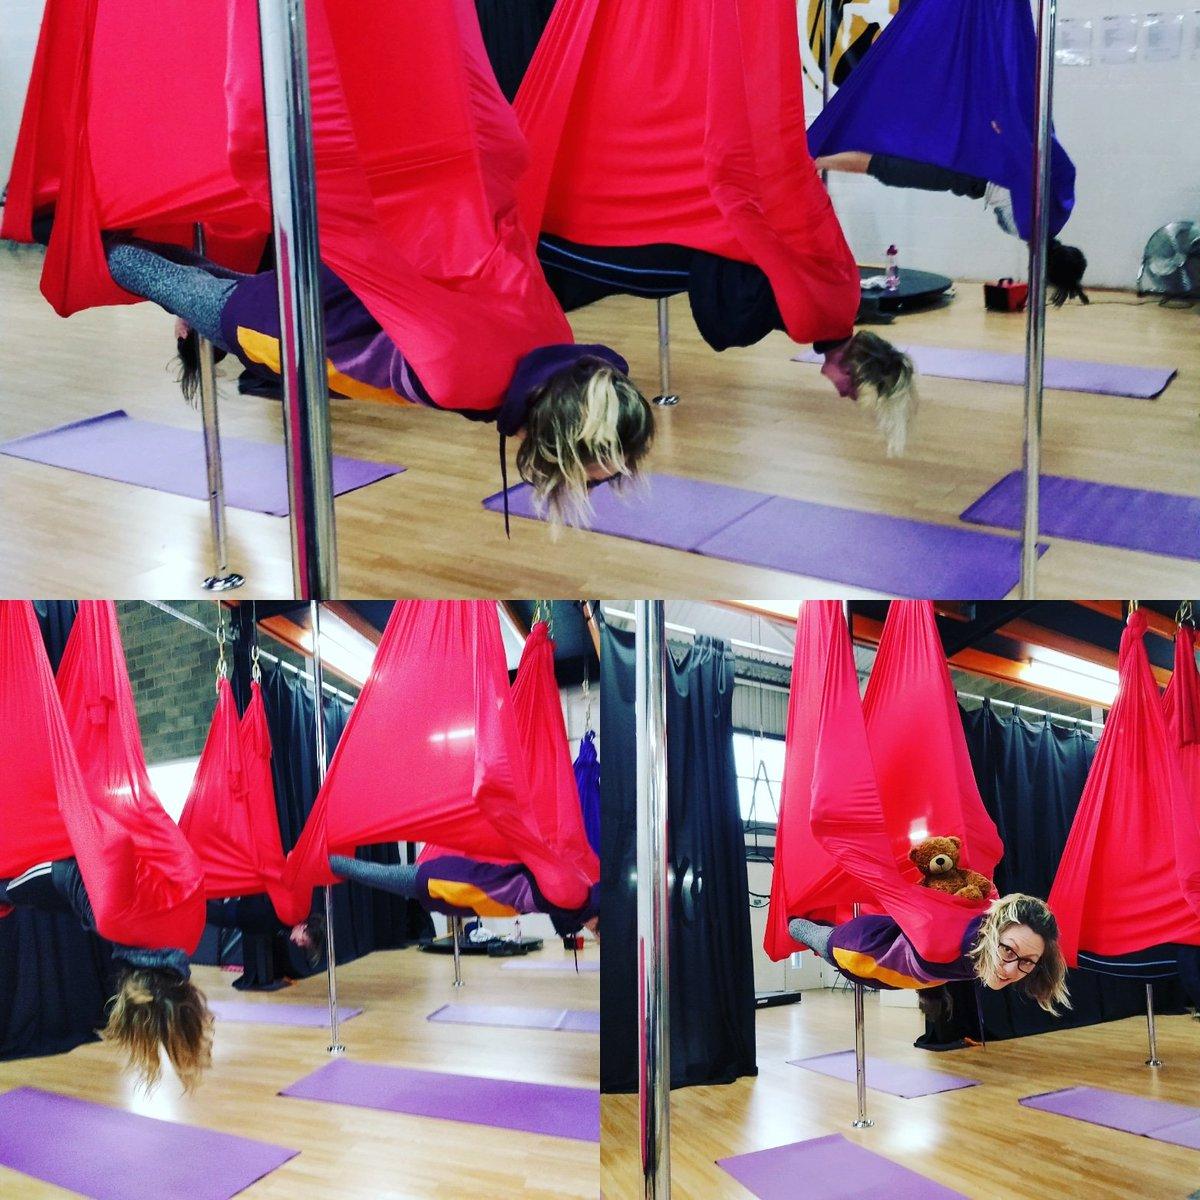 Phoenix Phitness On Twitter Vampire Stretch At Aerial Yoga Class